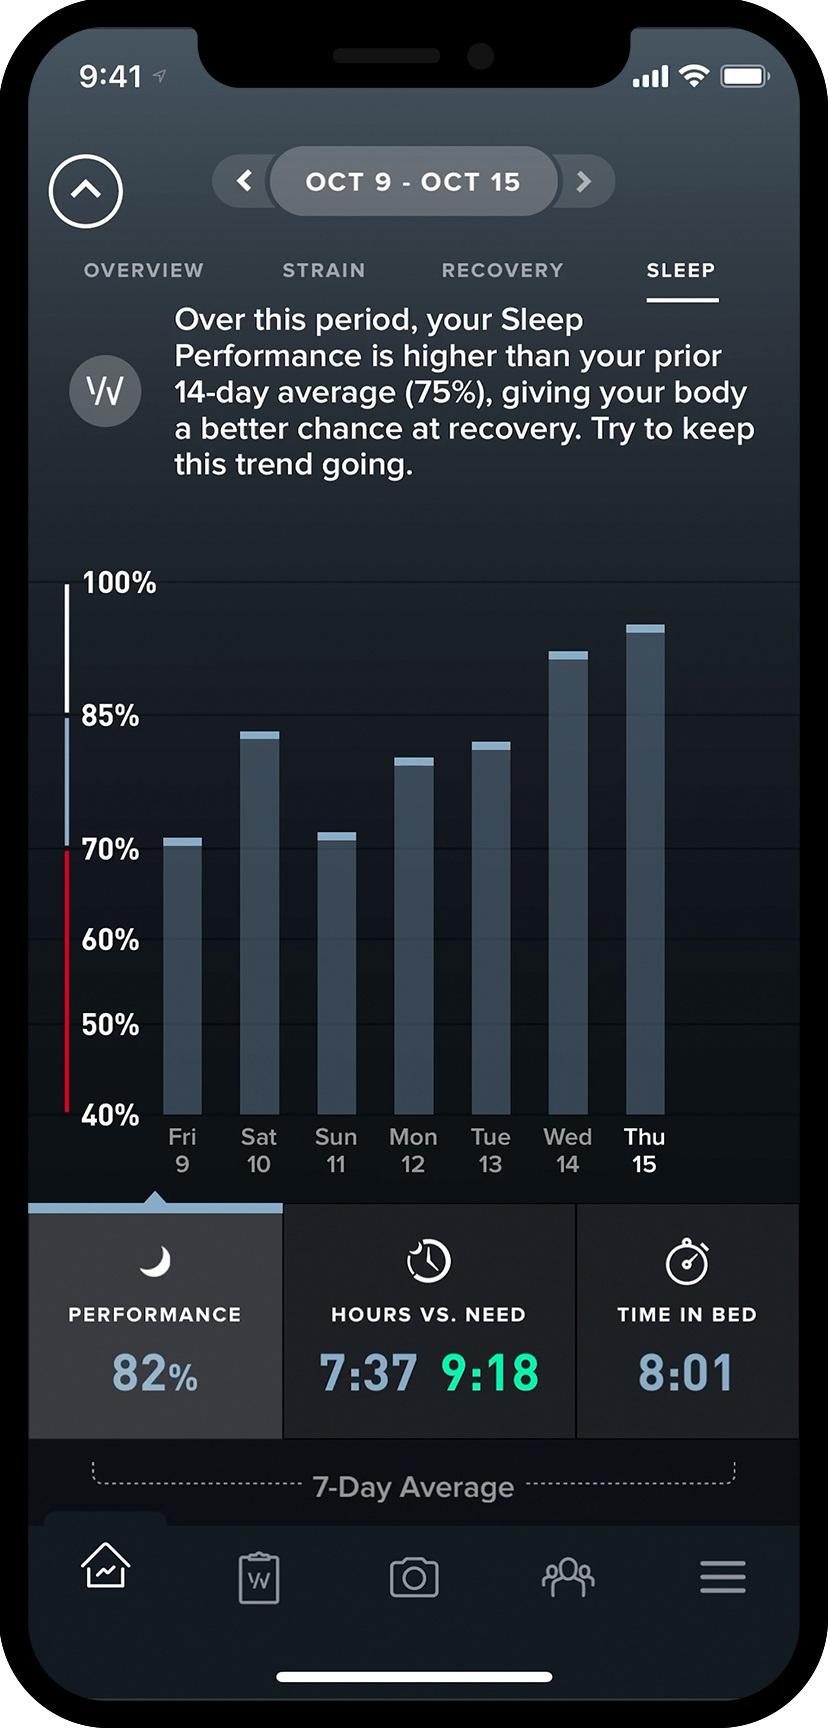 iPhone showing sleep performance on WHOOP Strap app